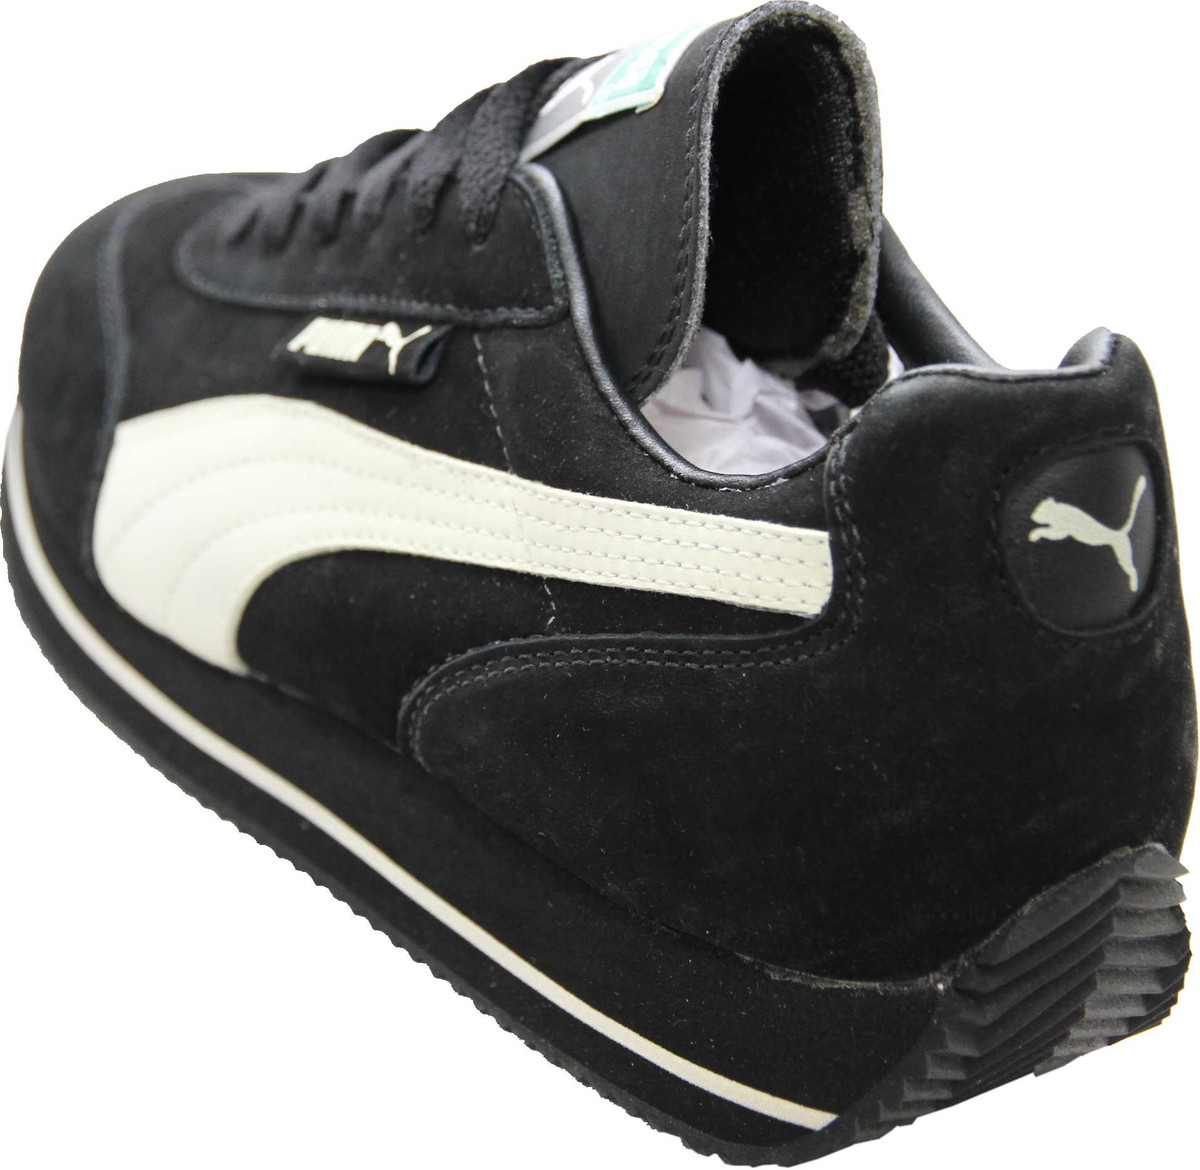 Puma Shoes Street Cat Nubuck Black Sand Running Sneaker Sneaker